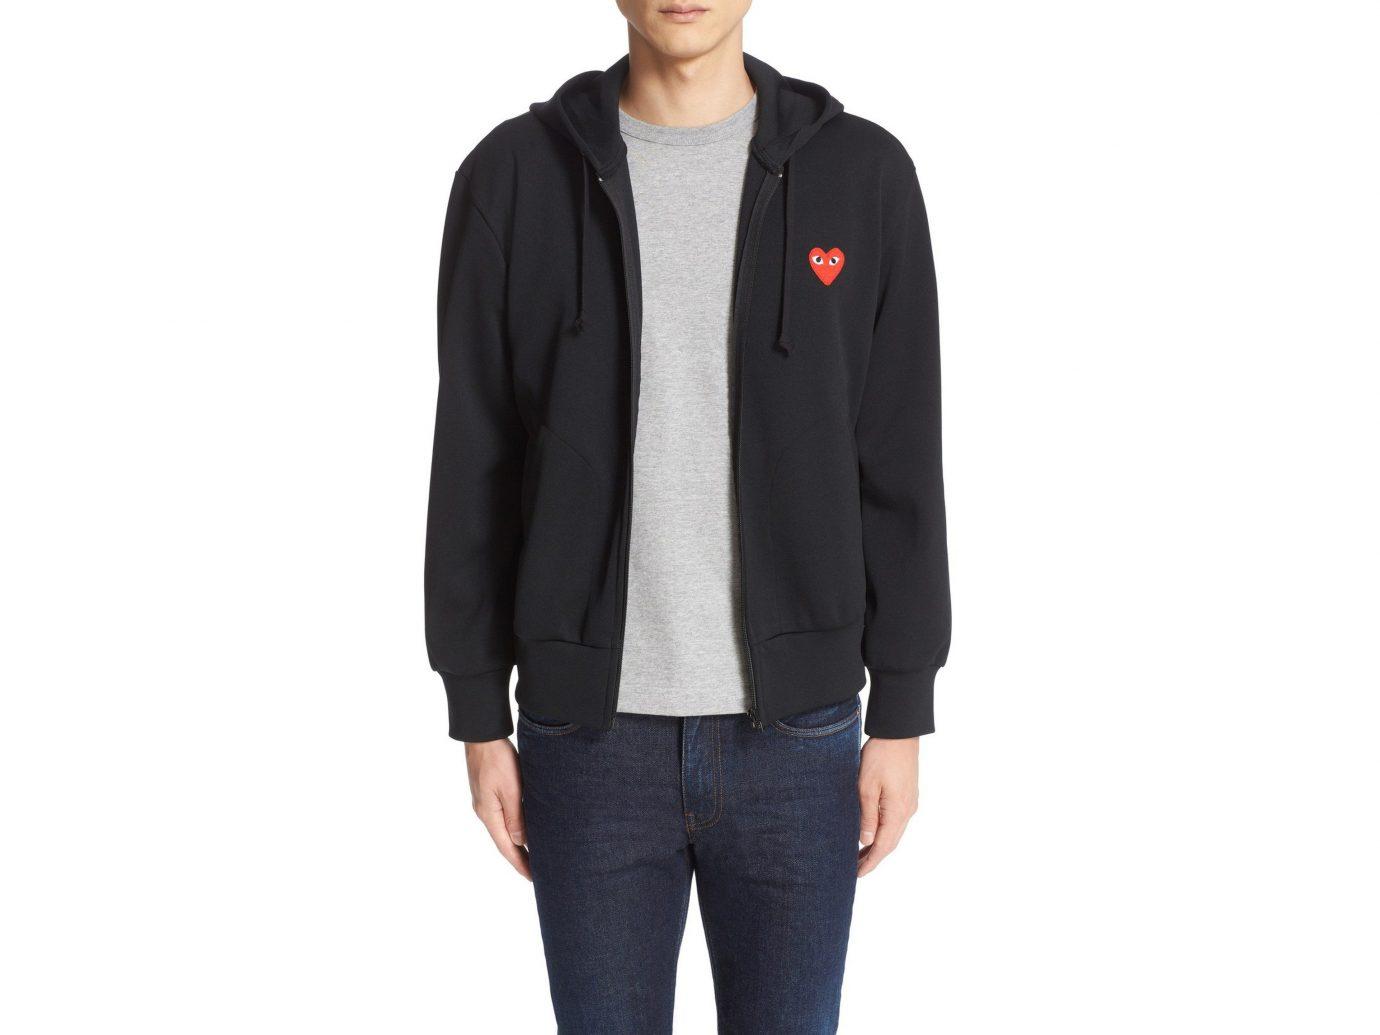 person man suit standing hood clothing wearing jacket posing sleeve polar fleece hoodie sweatshirt dressed clothes male